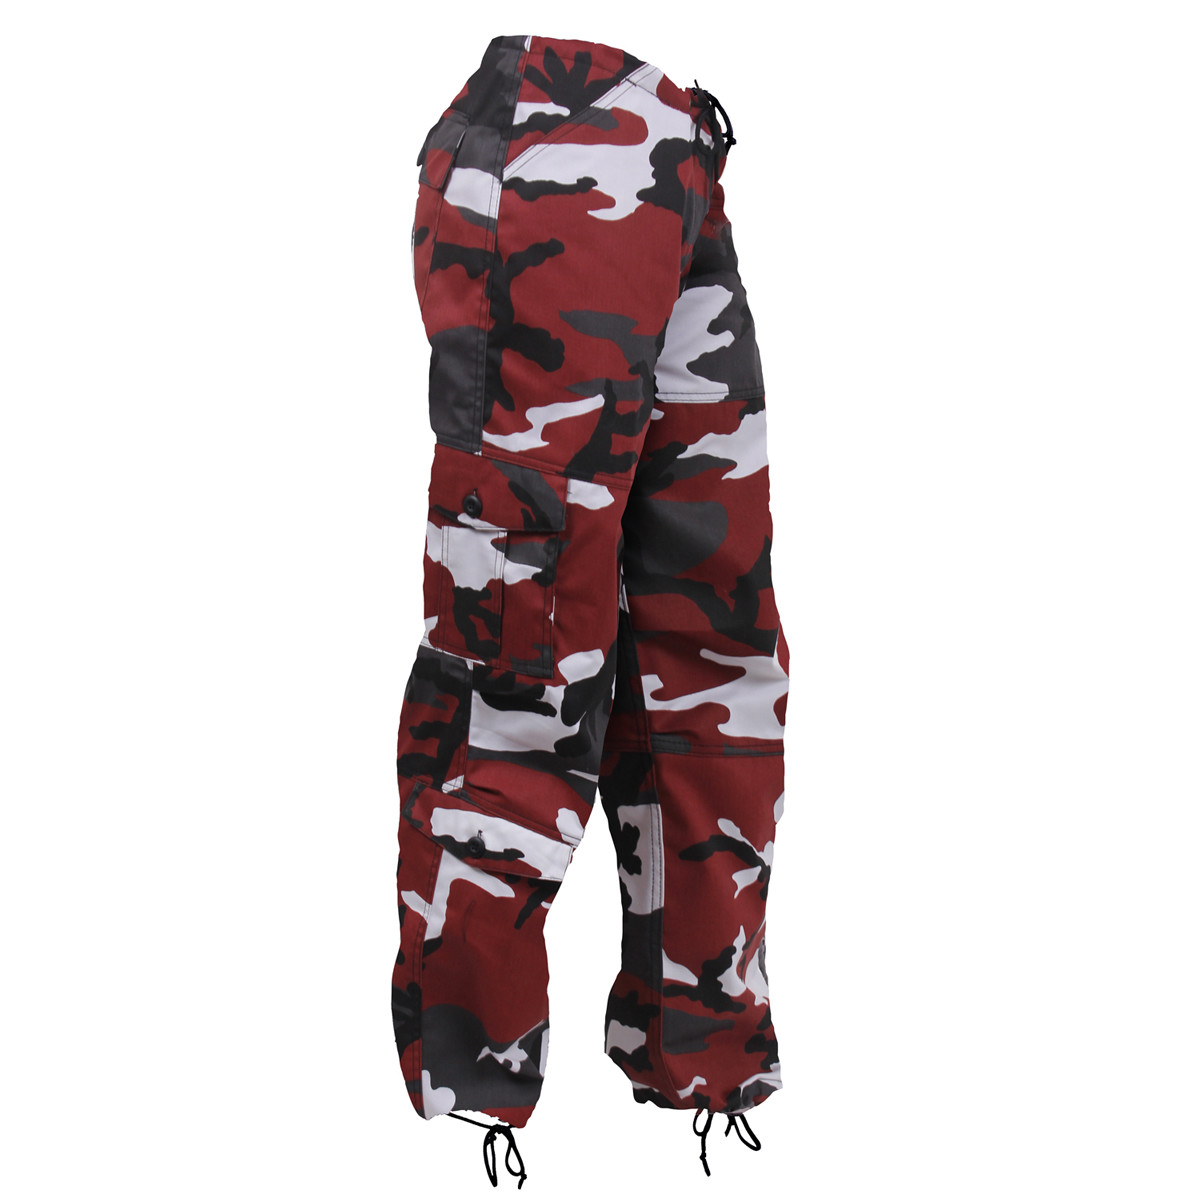 Shop Womens Red Camo Fatigue Pants - Fatigues Army Navy Gear 4d598320b